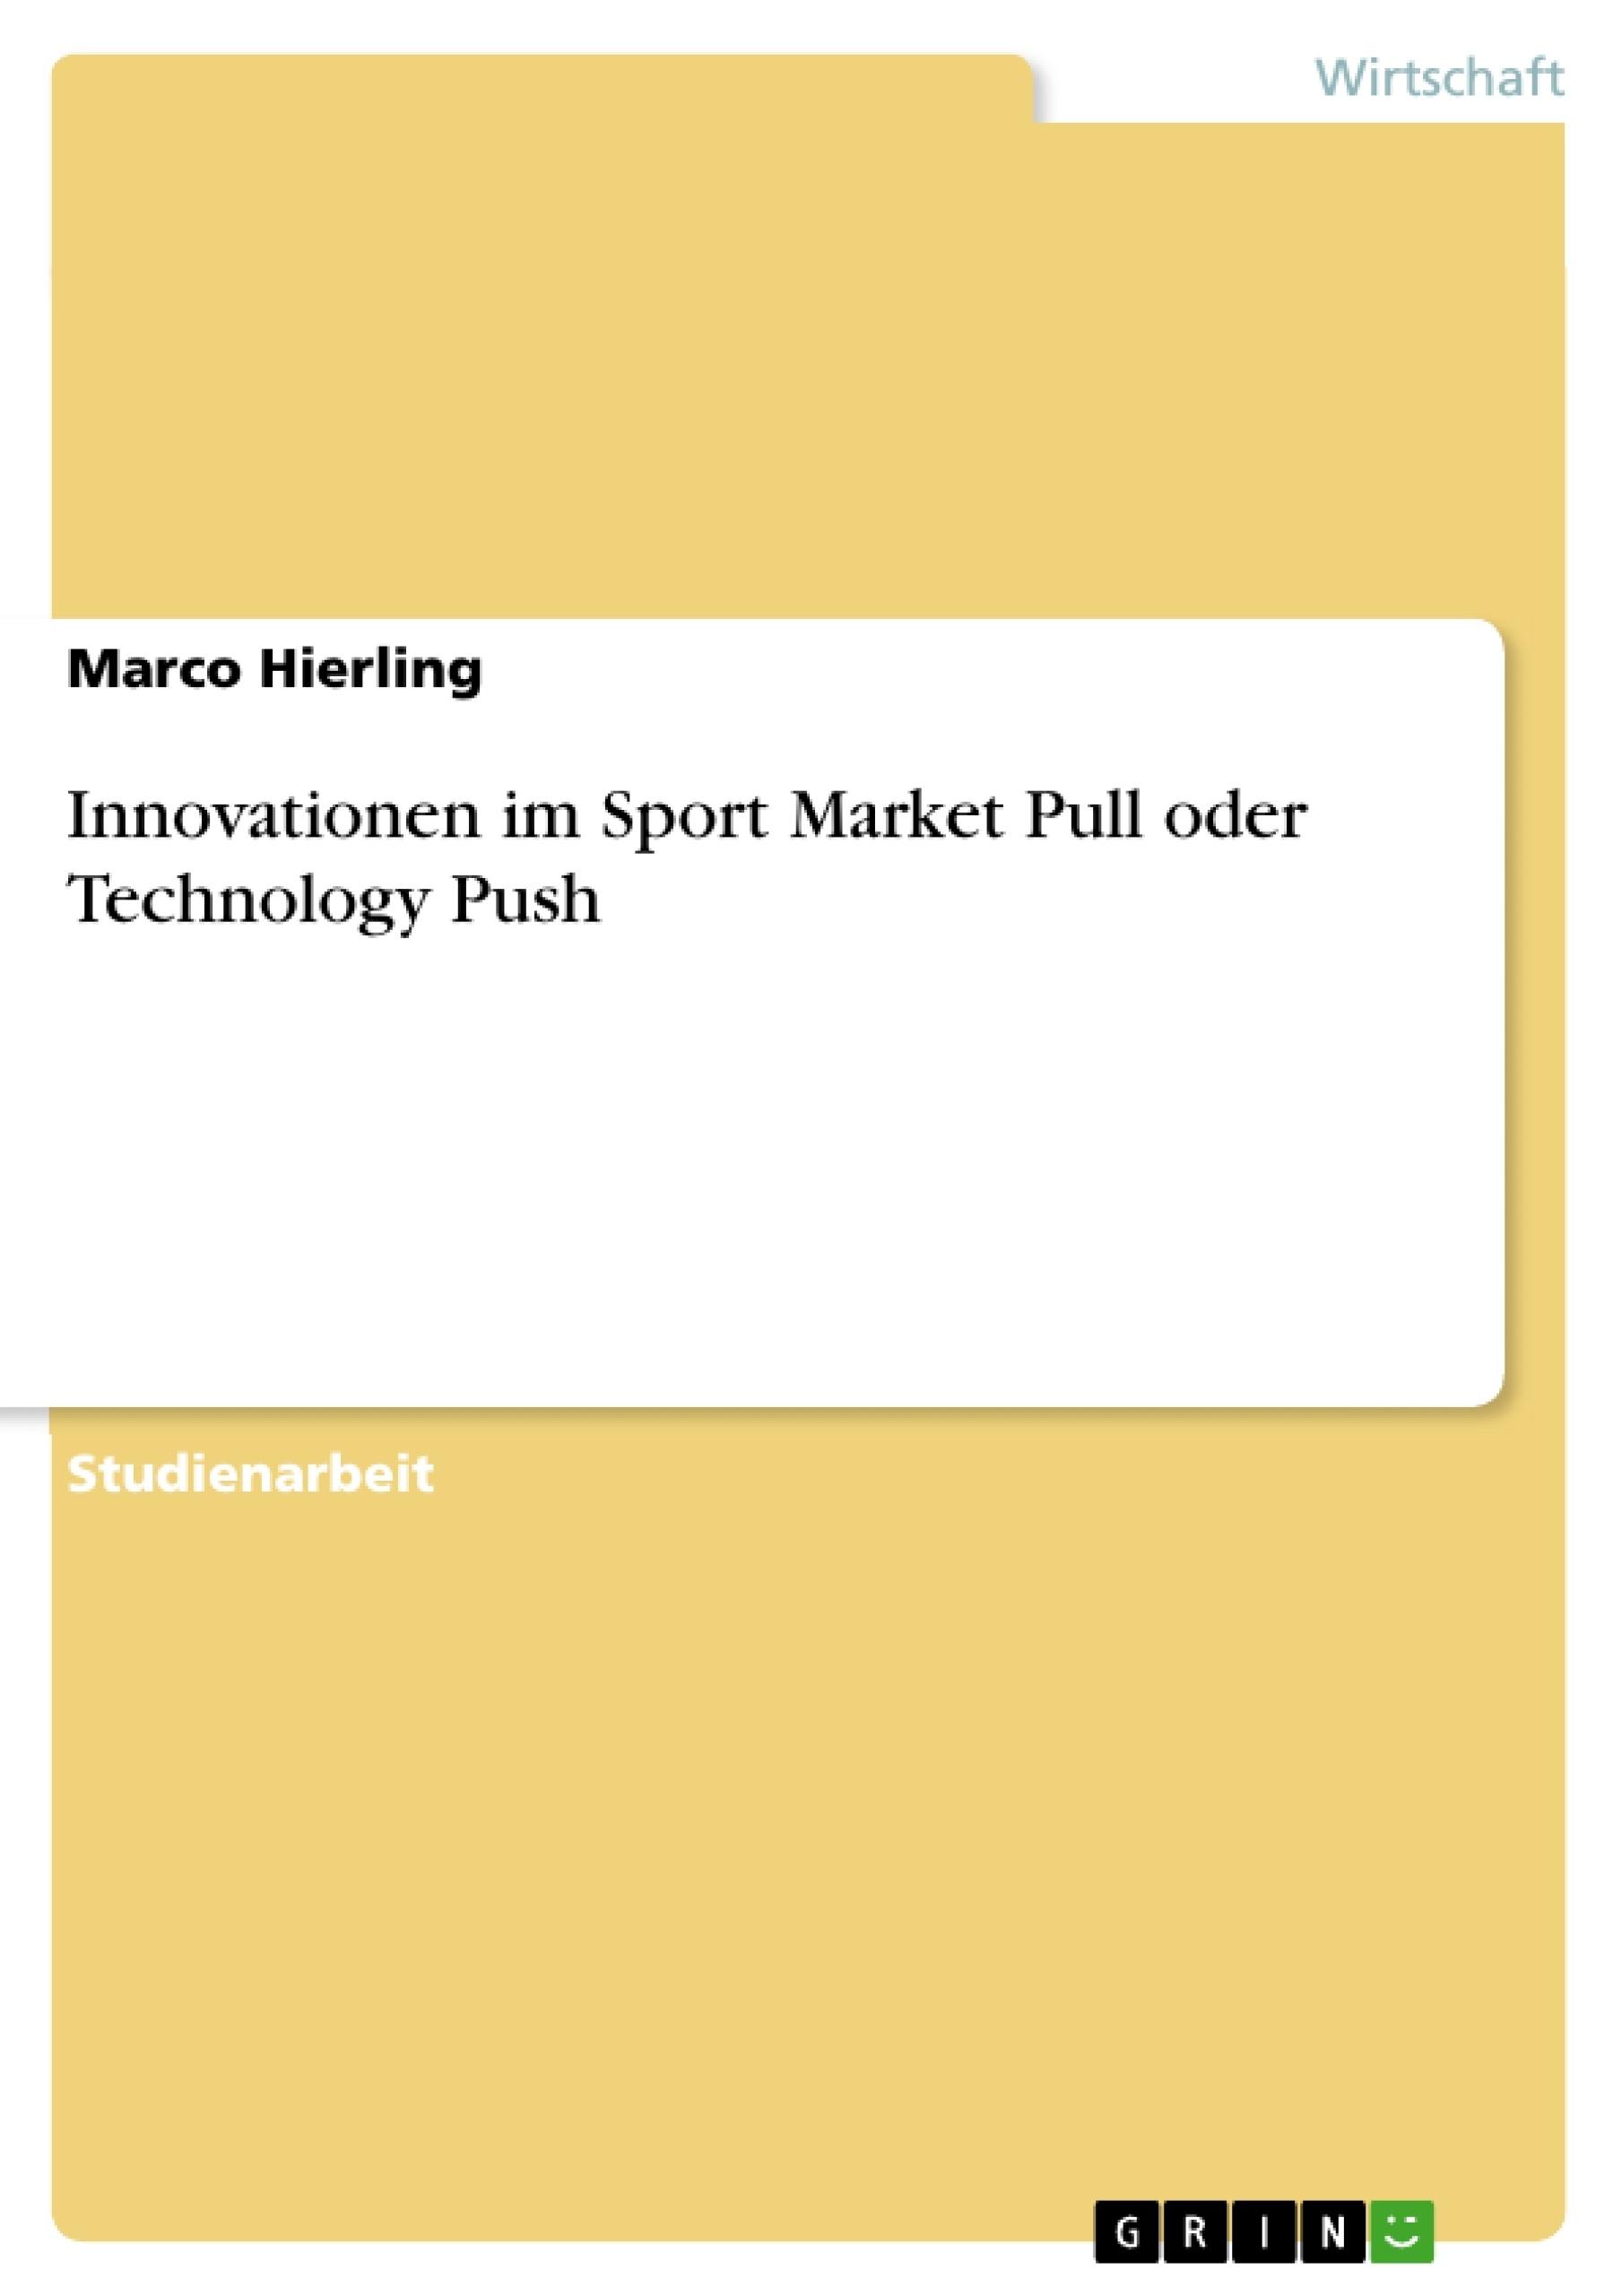 Titel: Innovationen im Sport Market Pull oder Technology Push